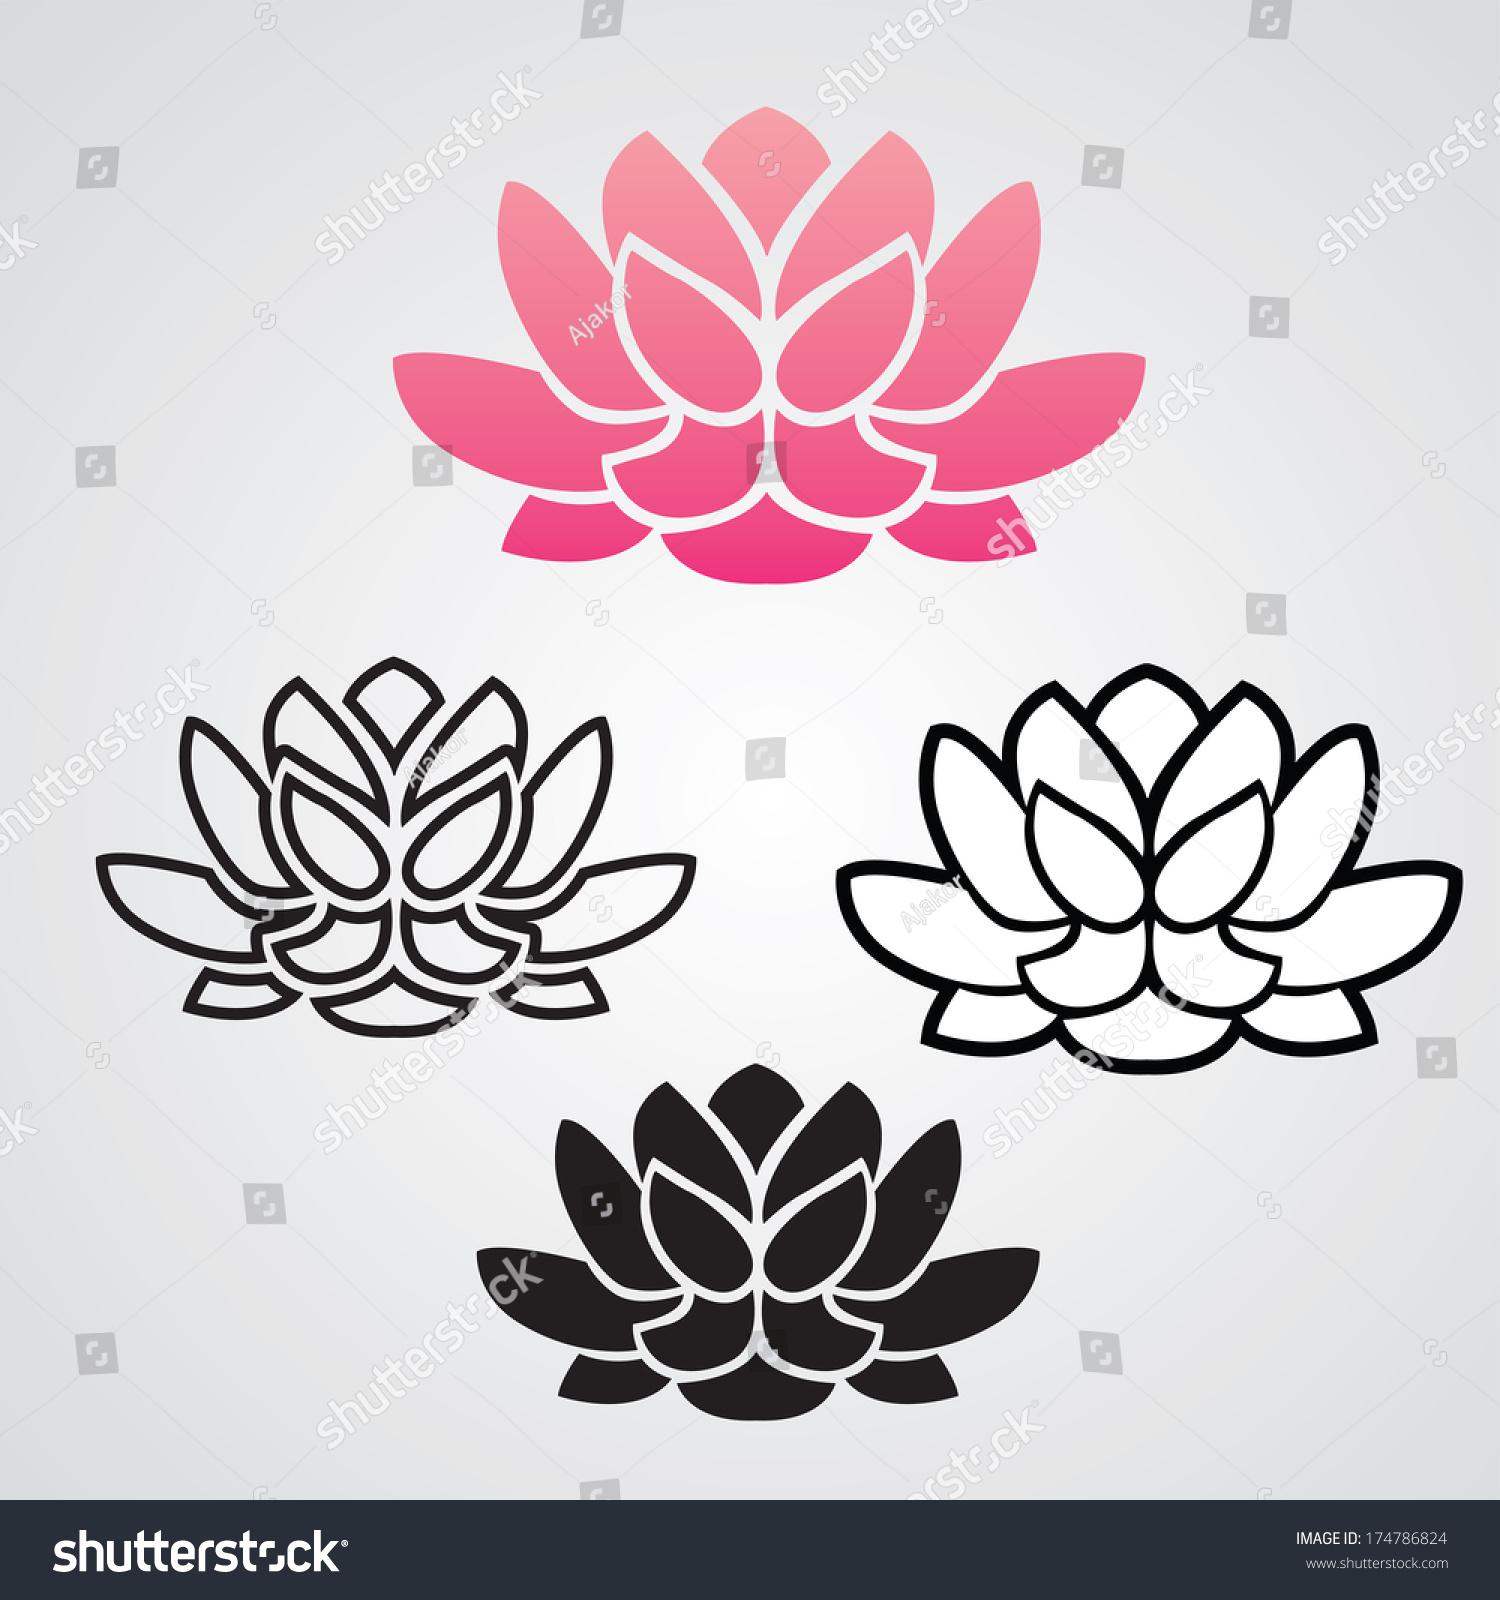 Symbol yoga lotus flower graphic vector stock vector royalty free the symbol of yoga lotus flower graphic vector illustration izmirmasajfo